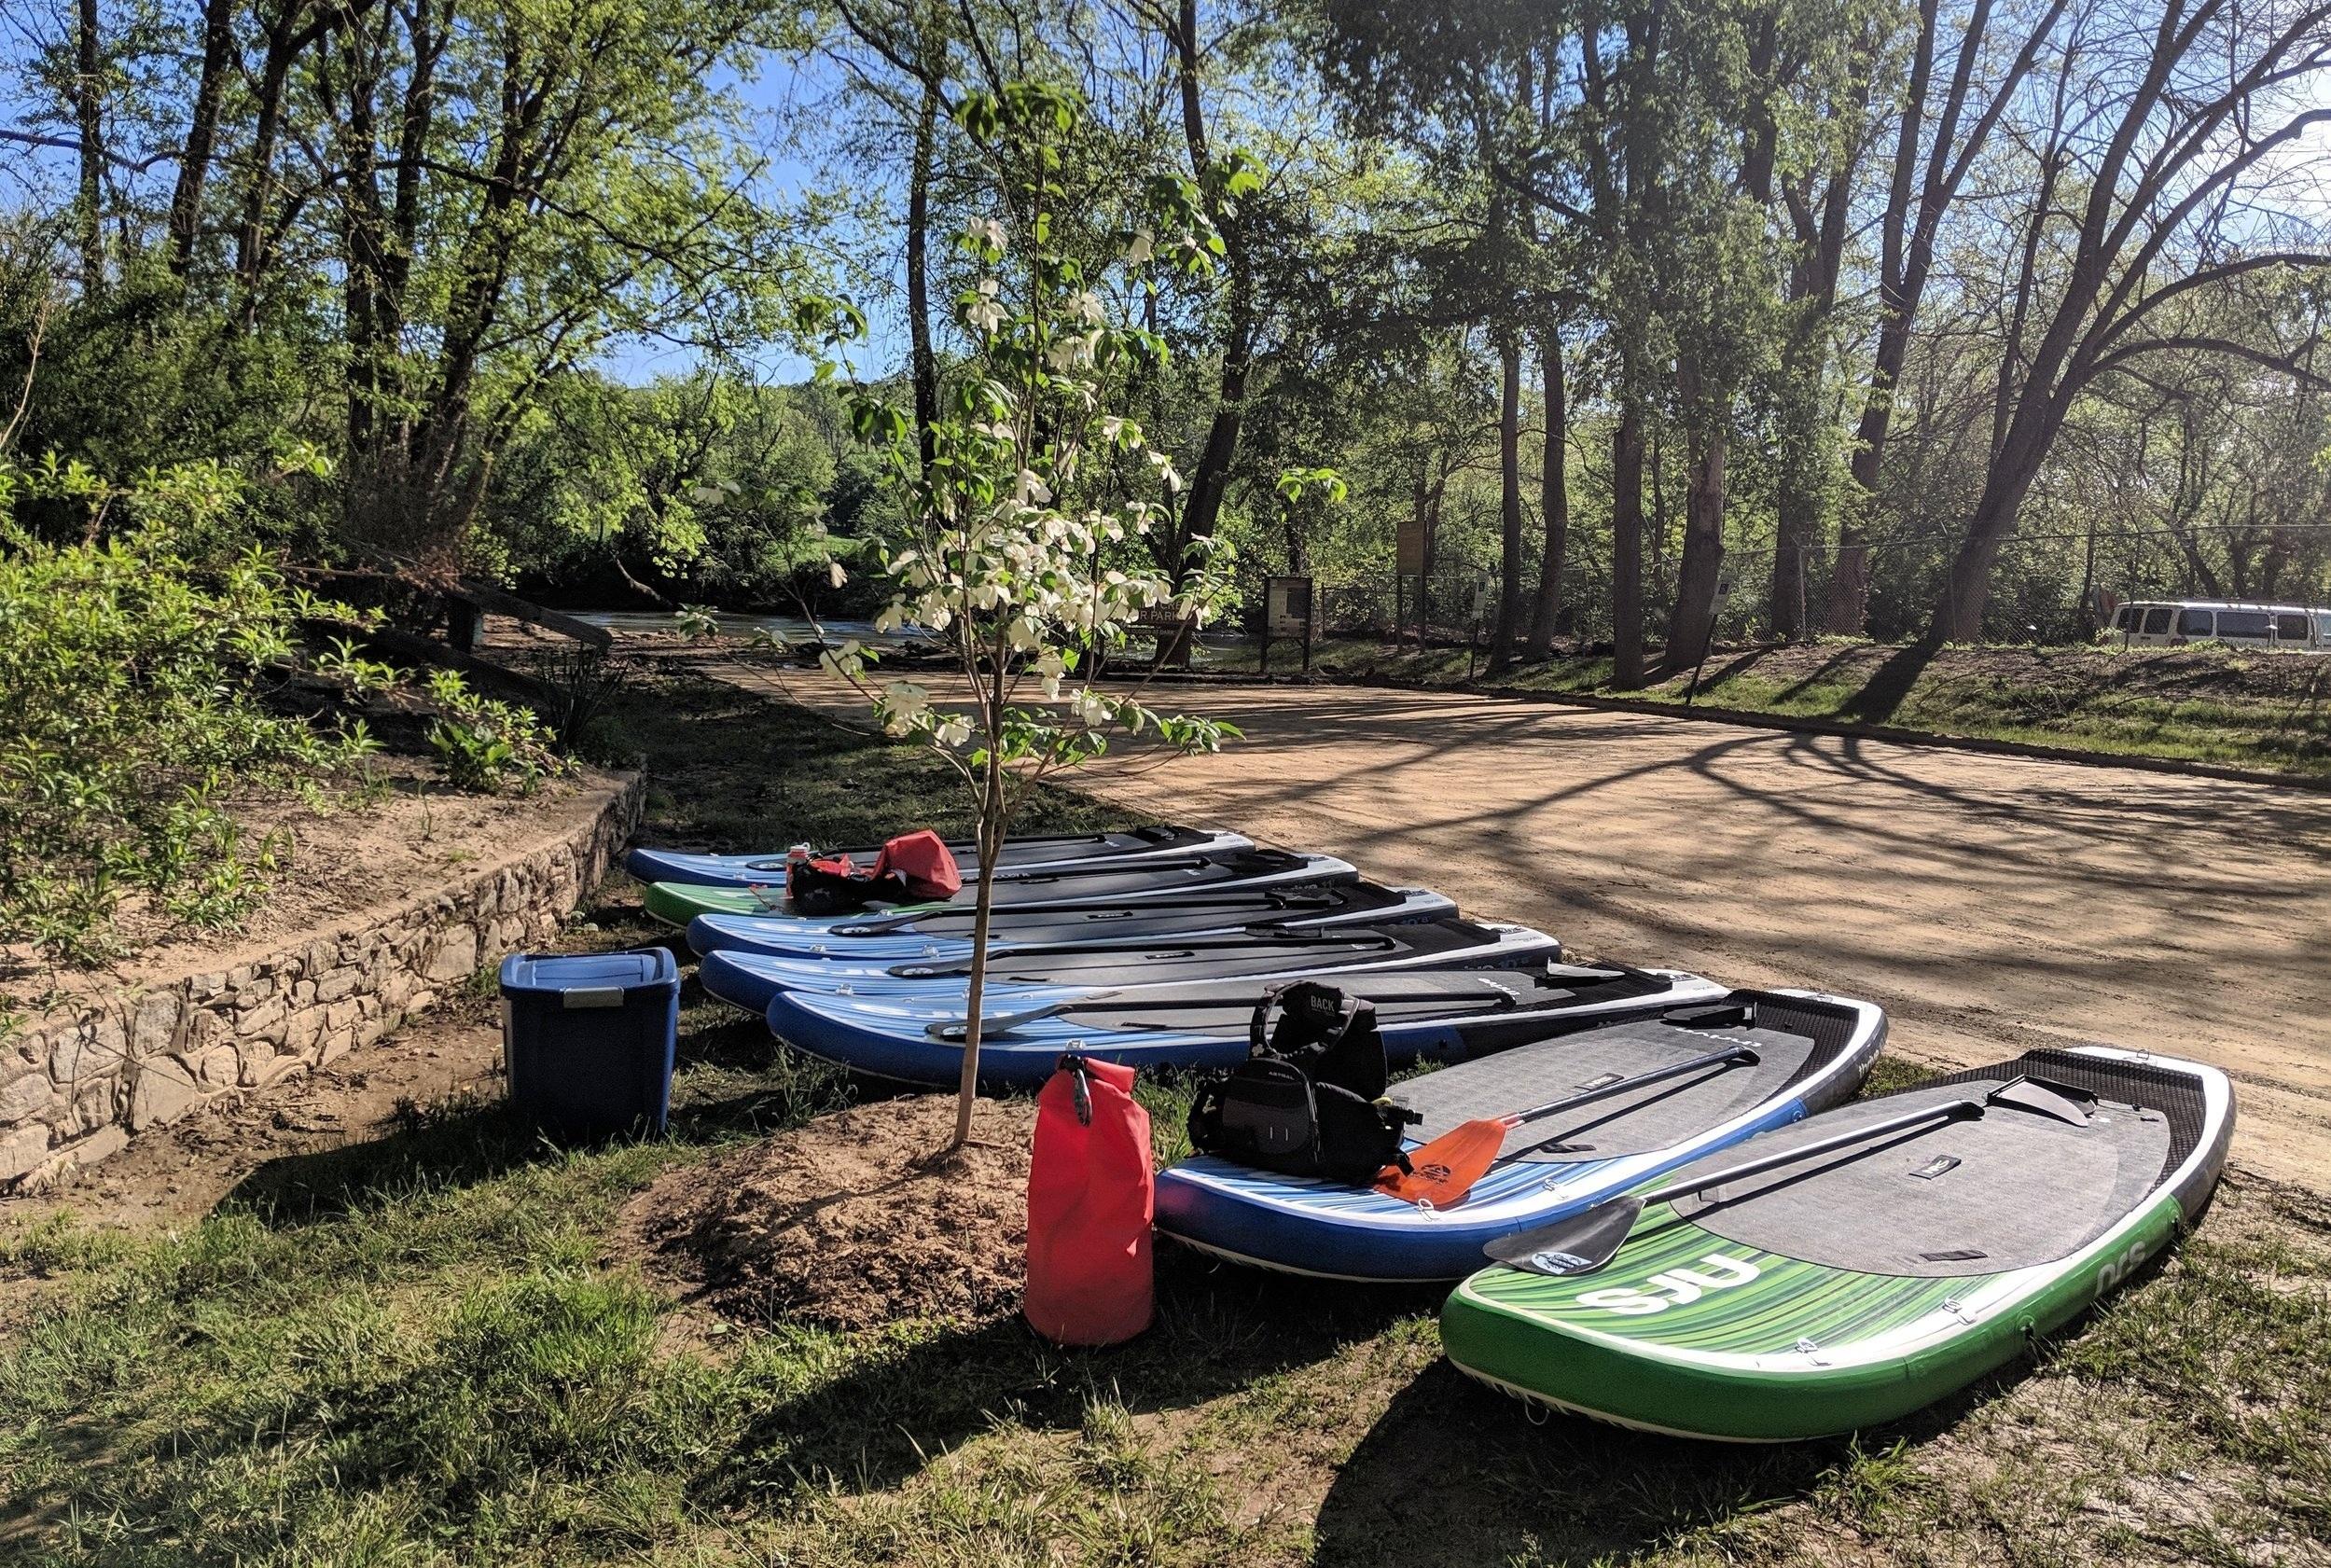 Standup Paddle Boarding - Location: Acadia NP, Bangor AreaPrice: $35/personGroup Minimum/Maximum: 3/5